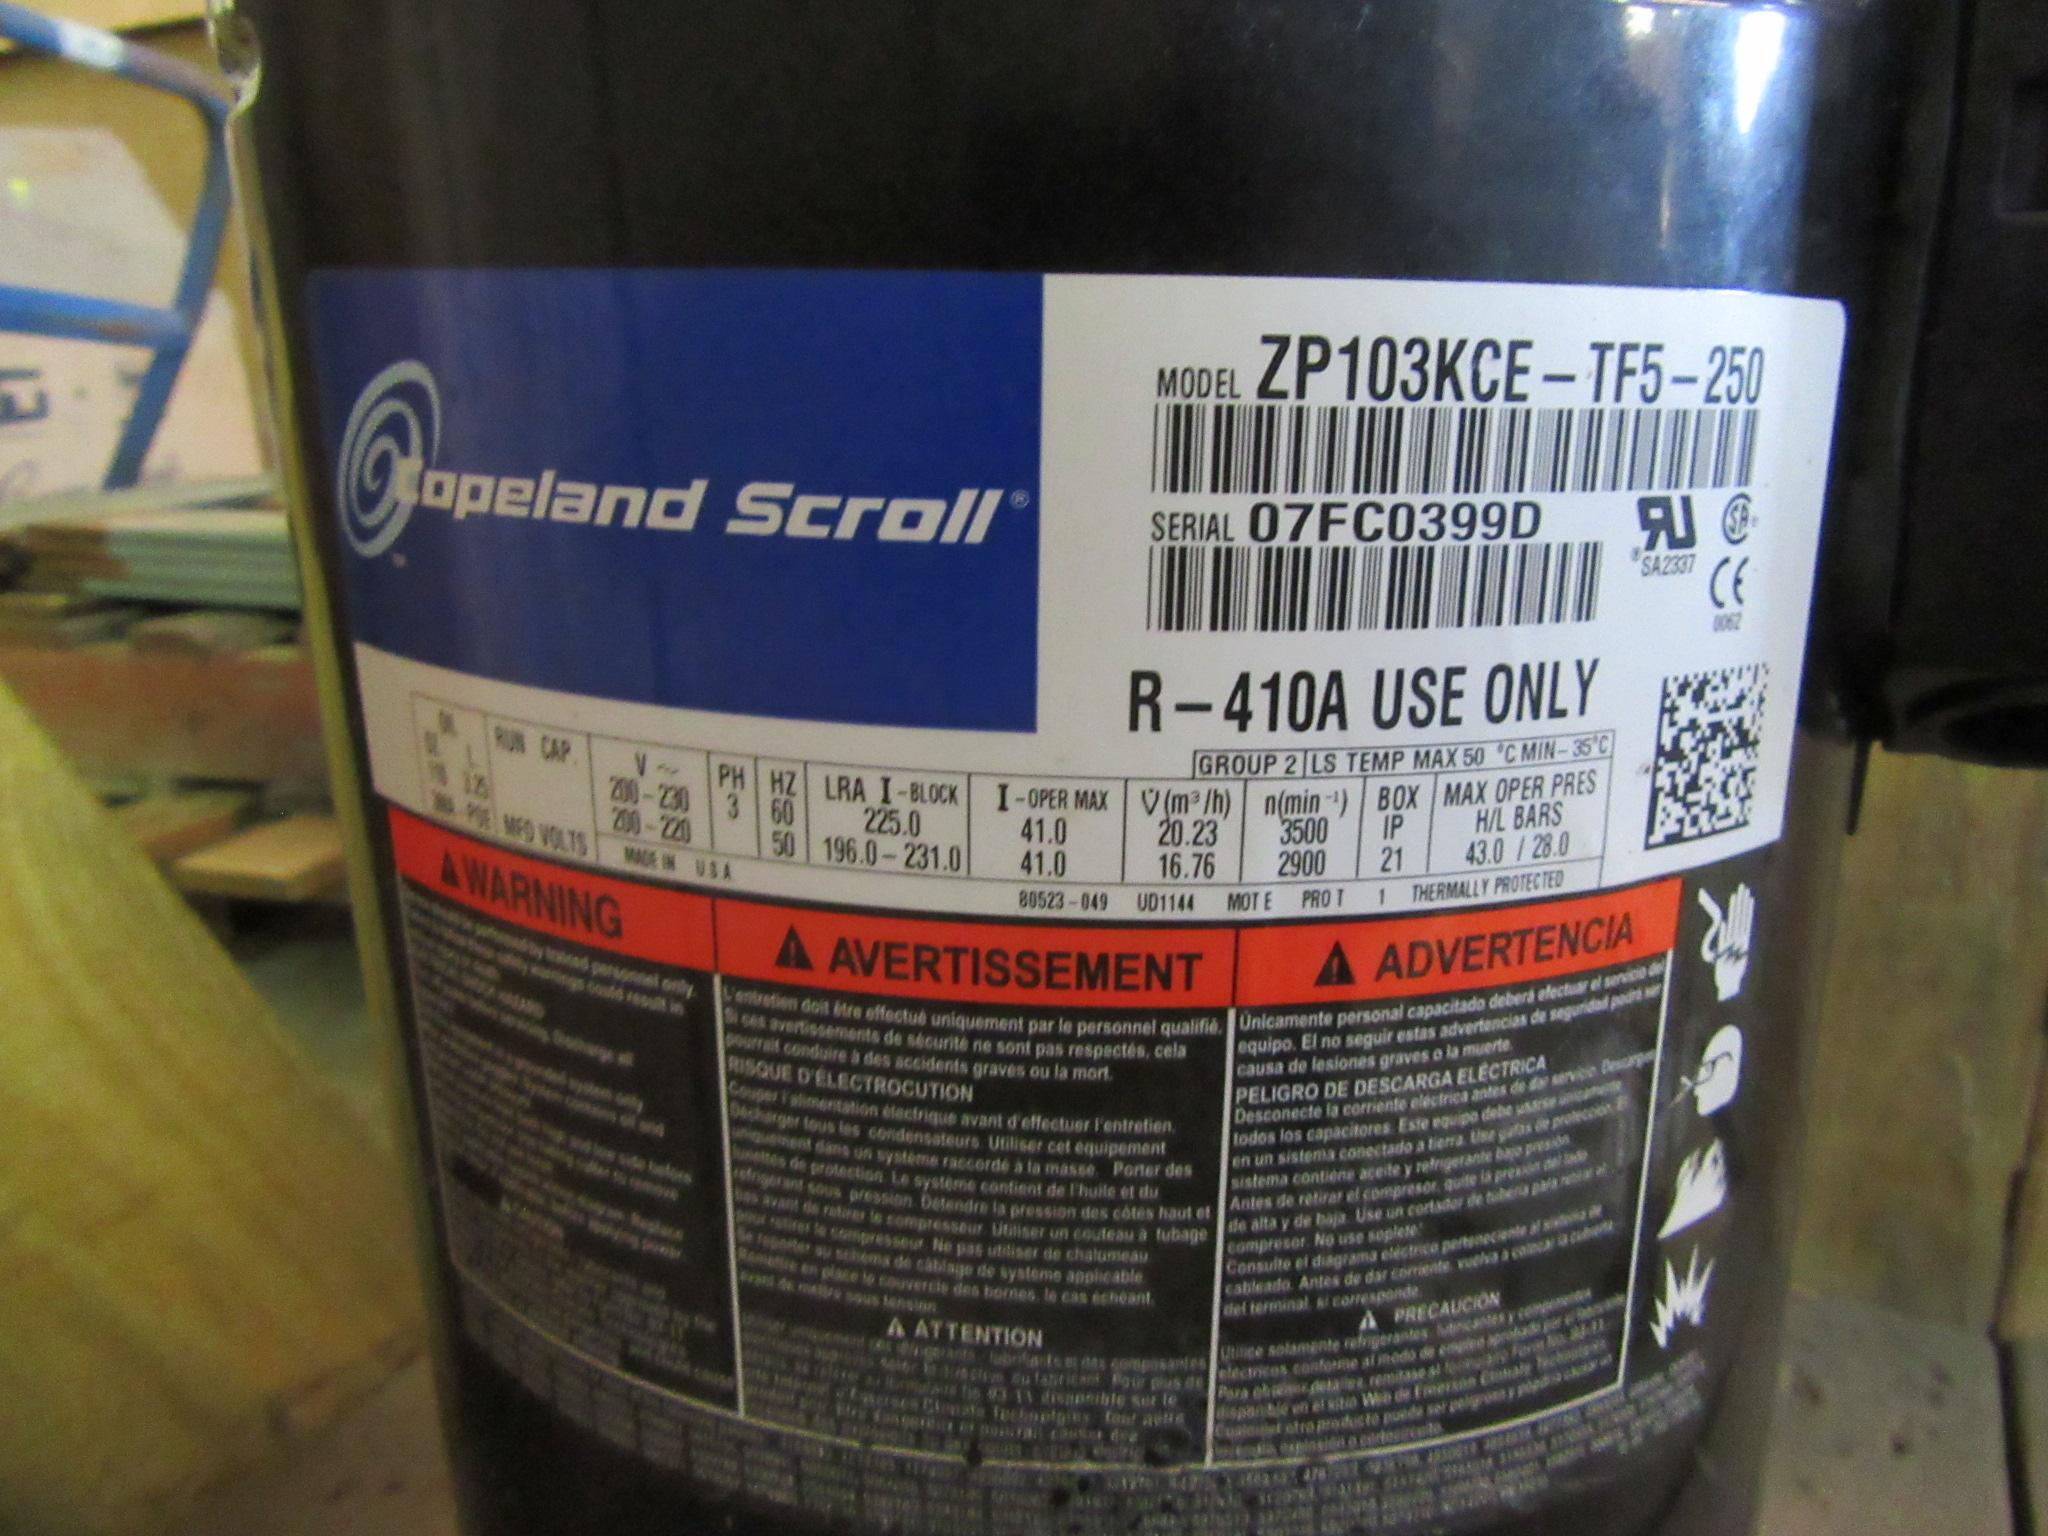 NEW SURPLUS 8 5 TON COPELAND SCROLL COMPRESSOR MODEL ZP103KCE-TF5-250